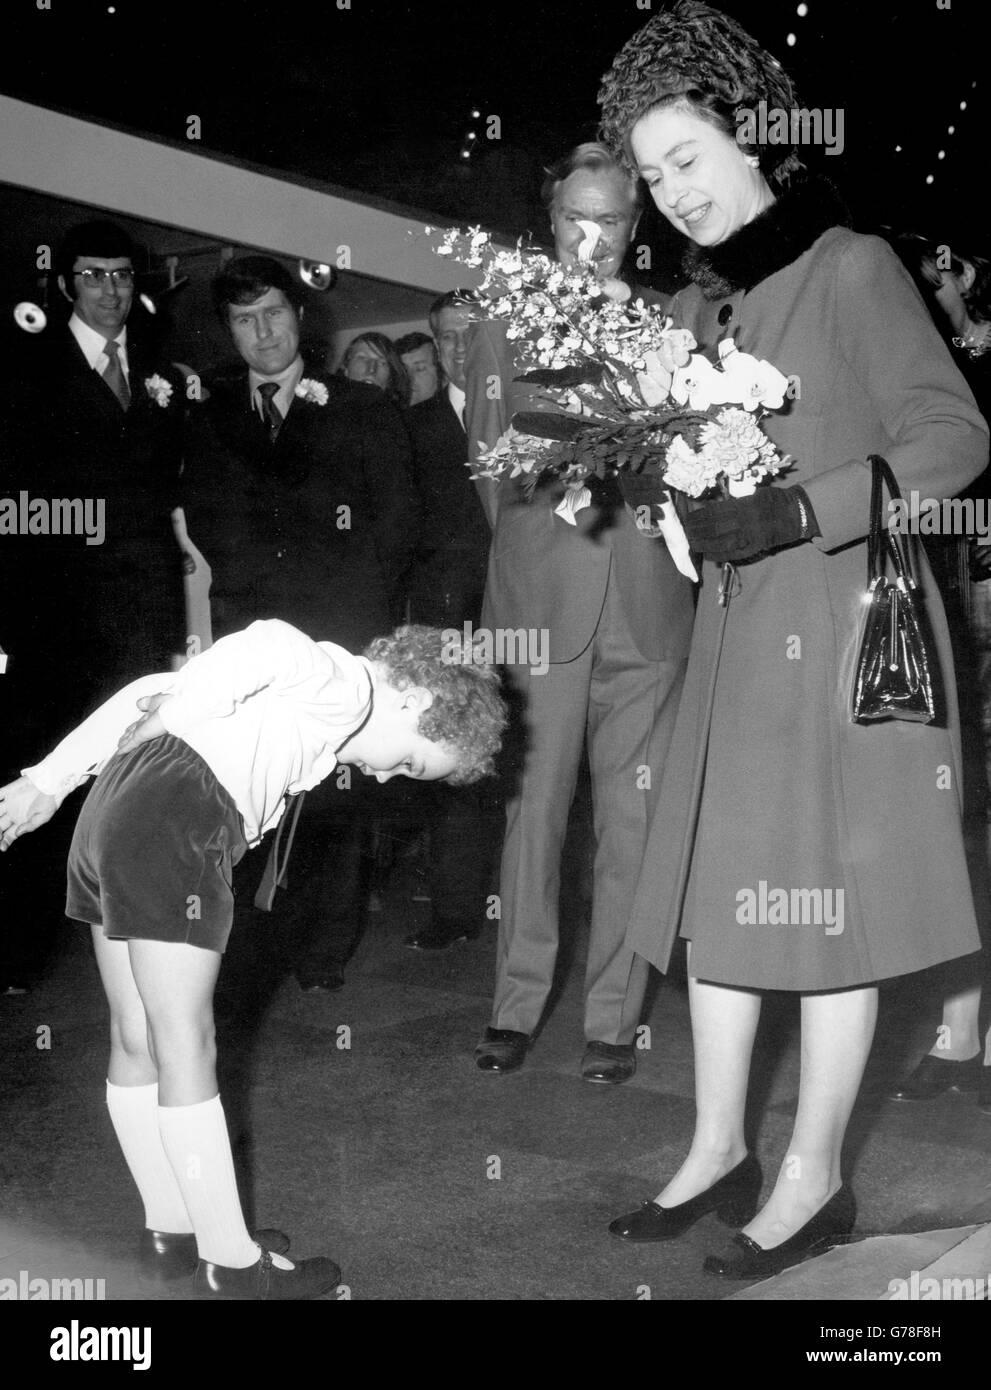 Royalty - Queen Elizabeth II - Olympia - Stock Image